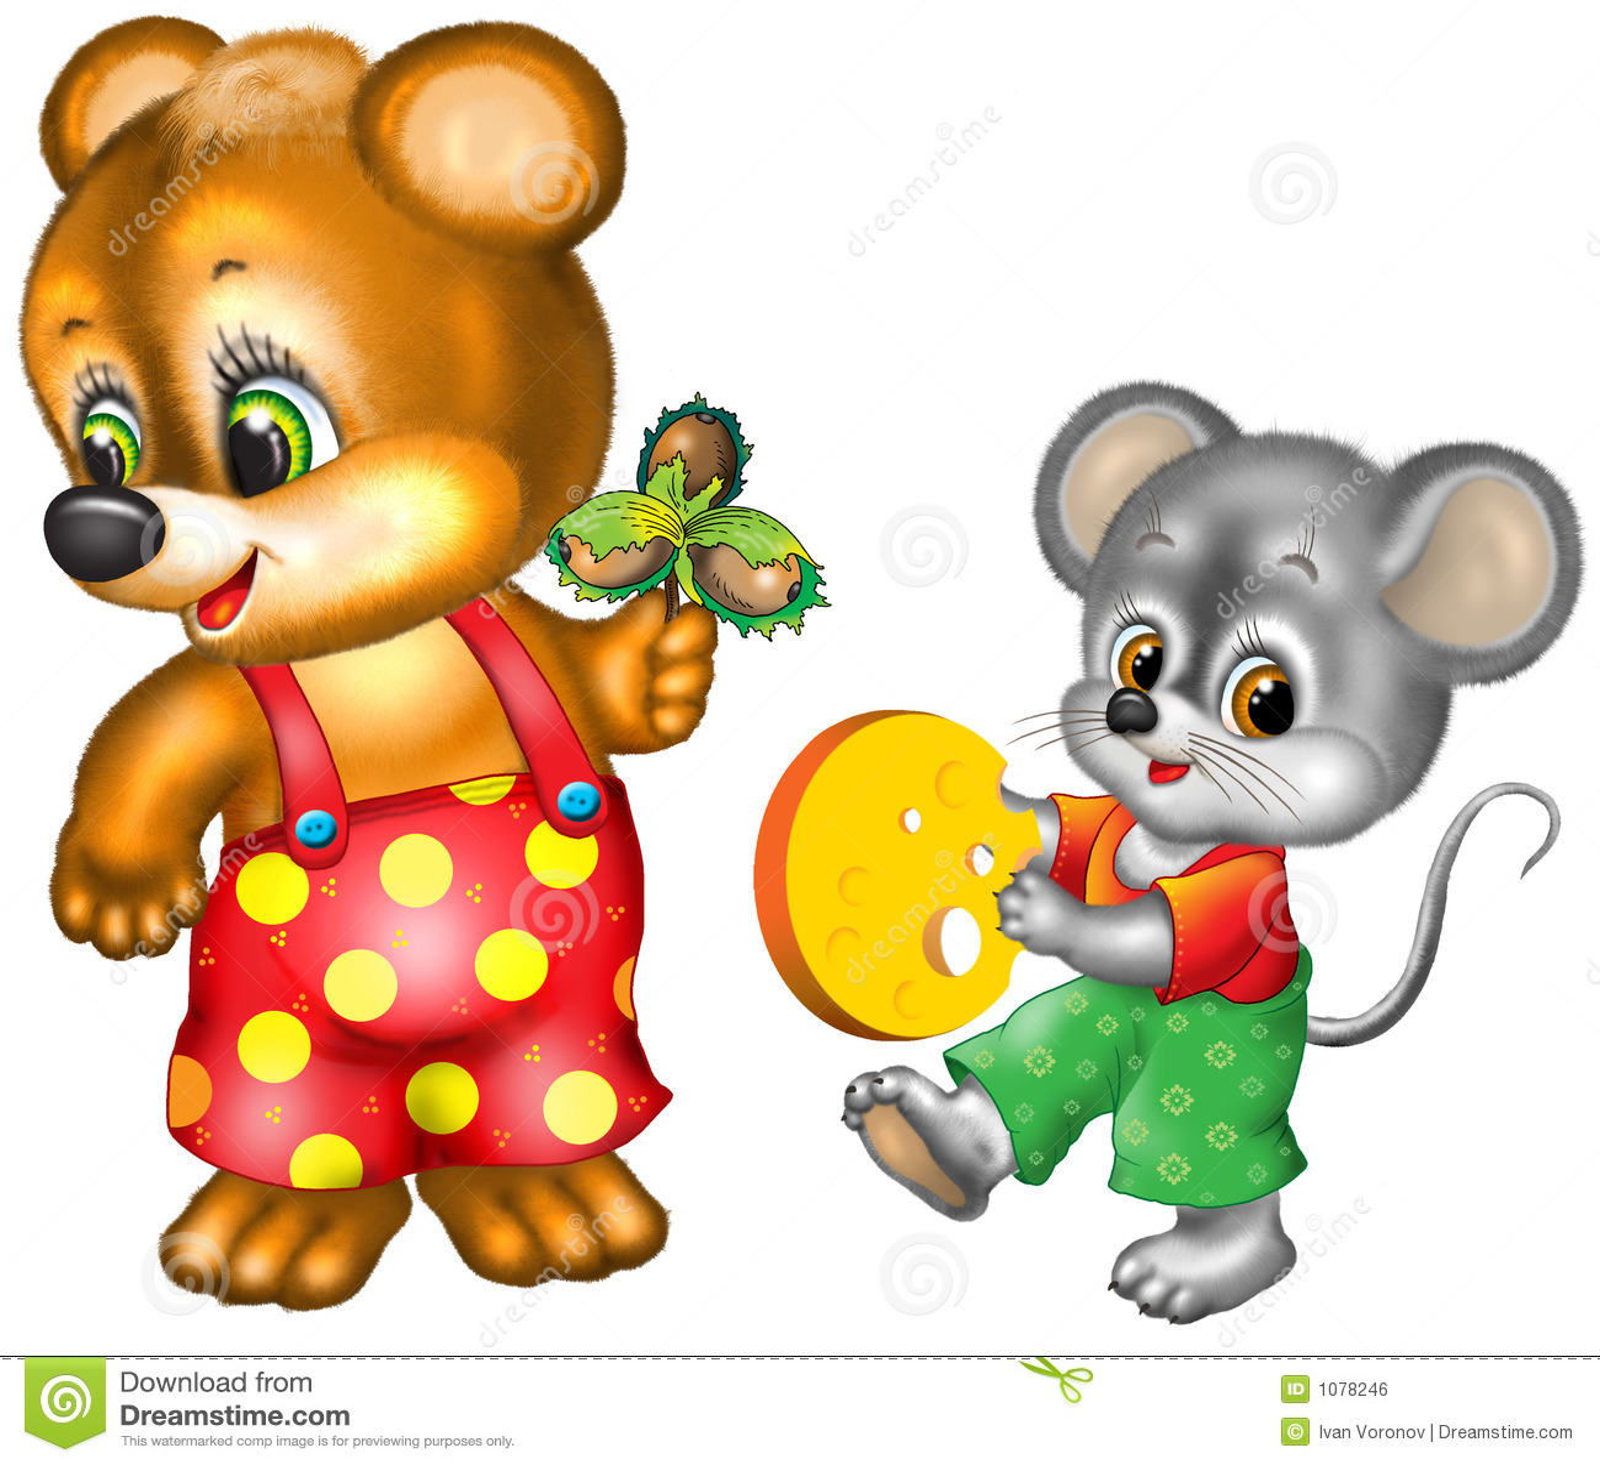 Cartoon Bear And Mouse Royalty Free Stock Image - Image ... - photo#14